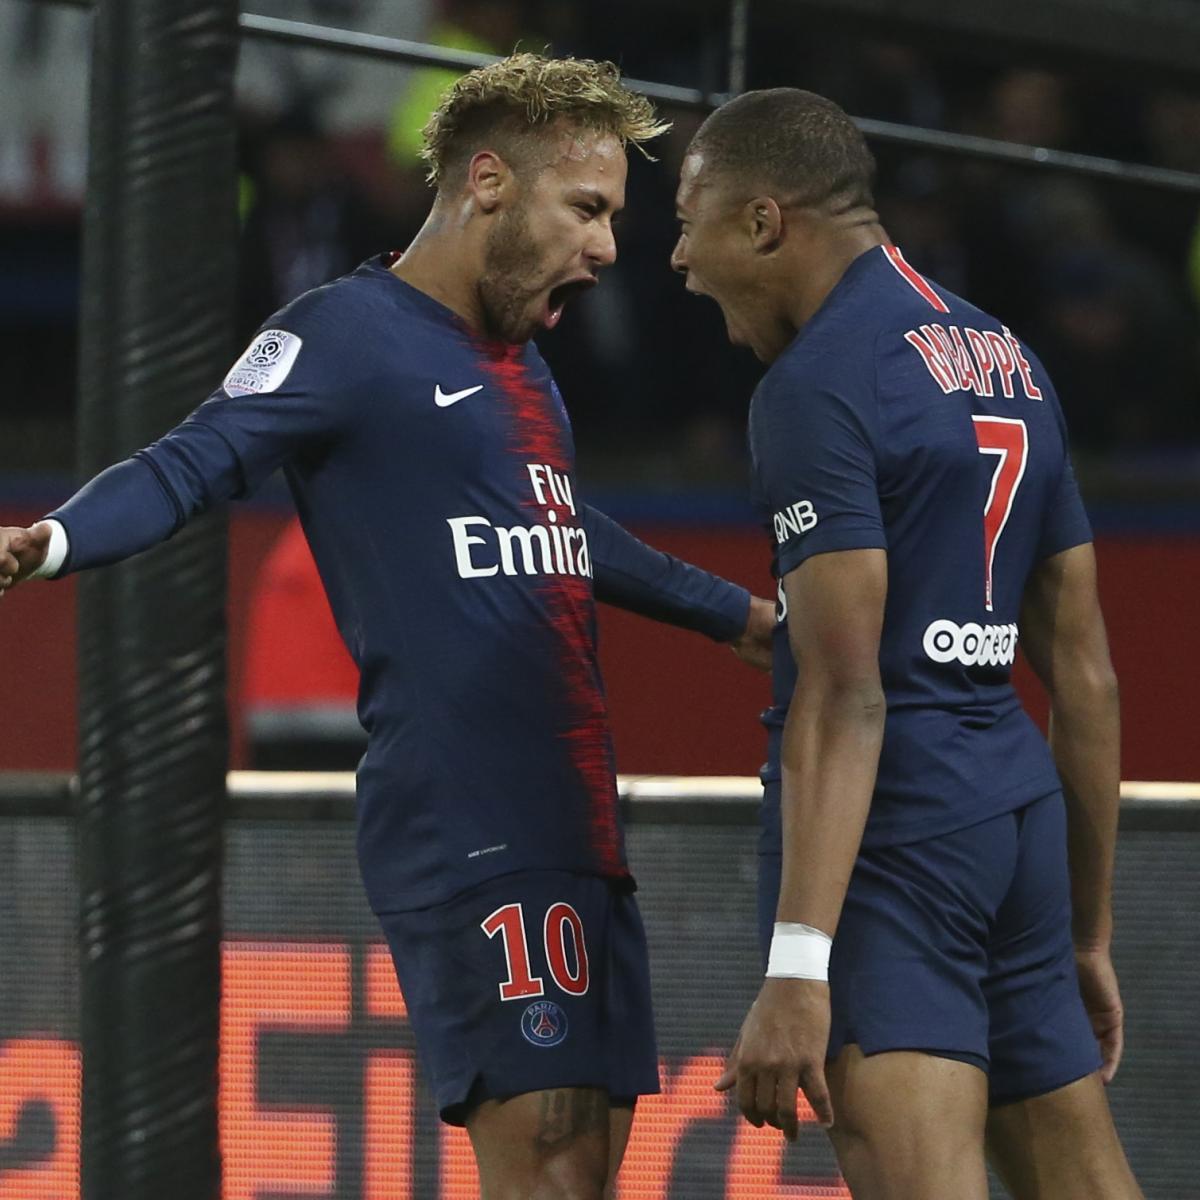 Kylian Mbappe a Better Target for Real Madrid Than Neymar, Says Steve McManaman